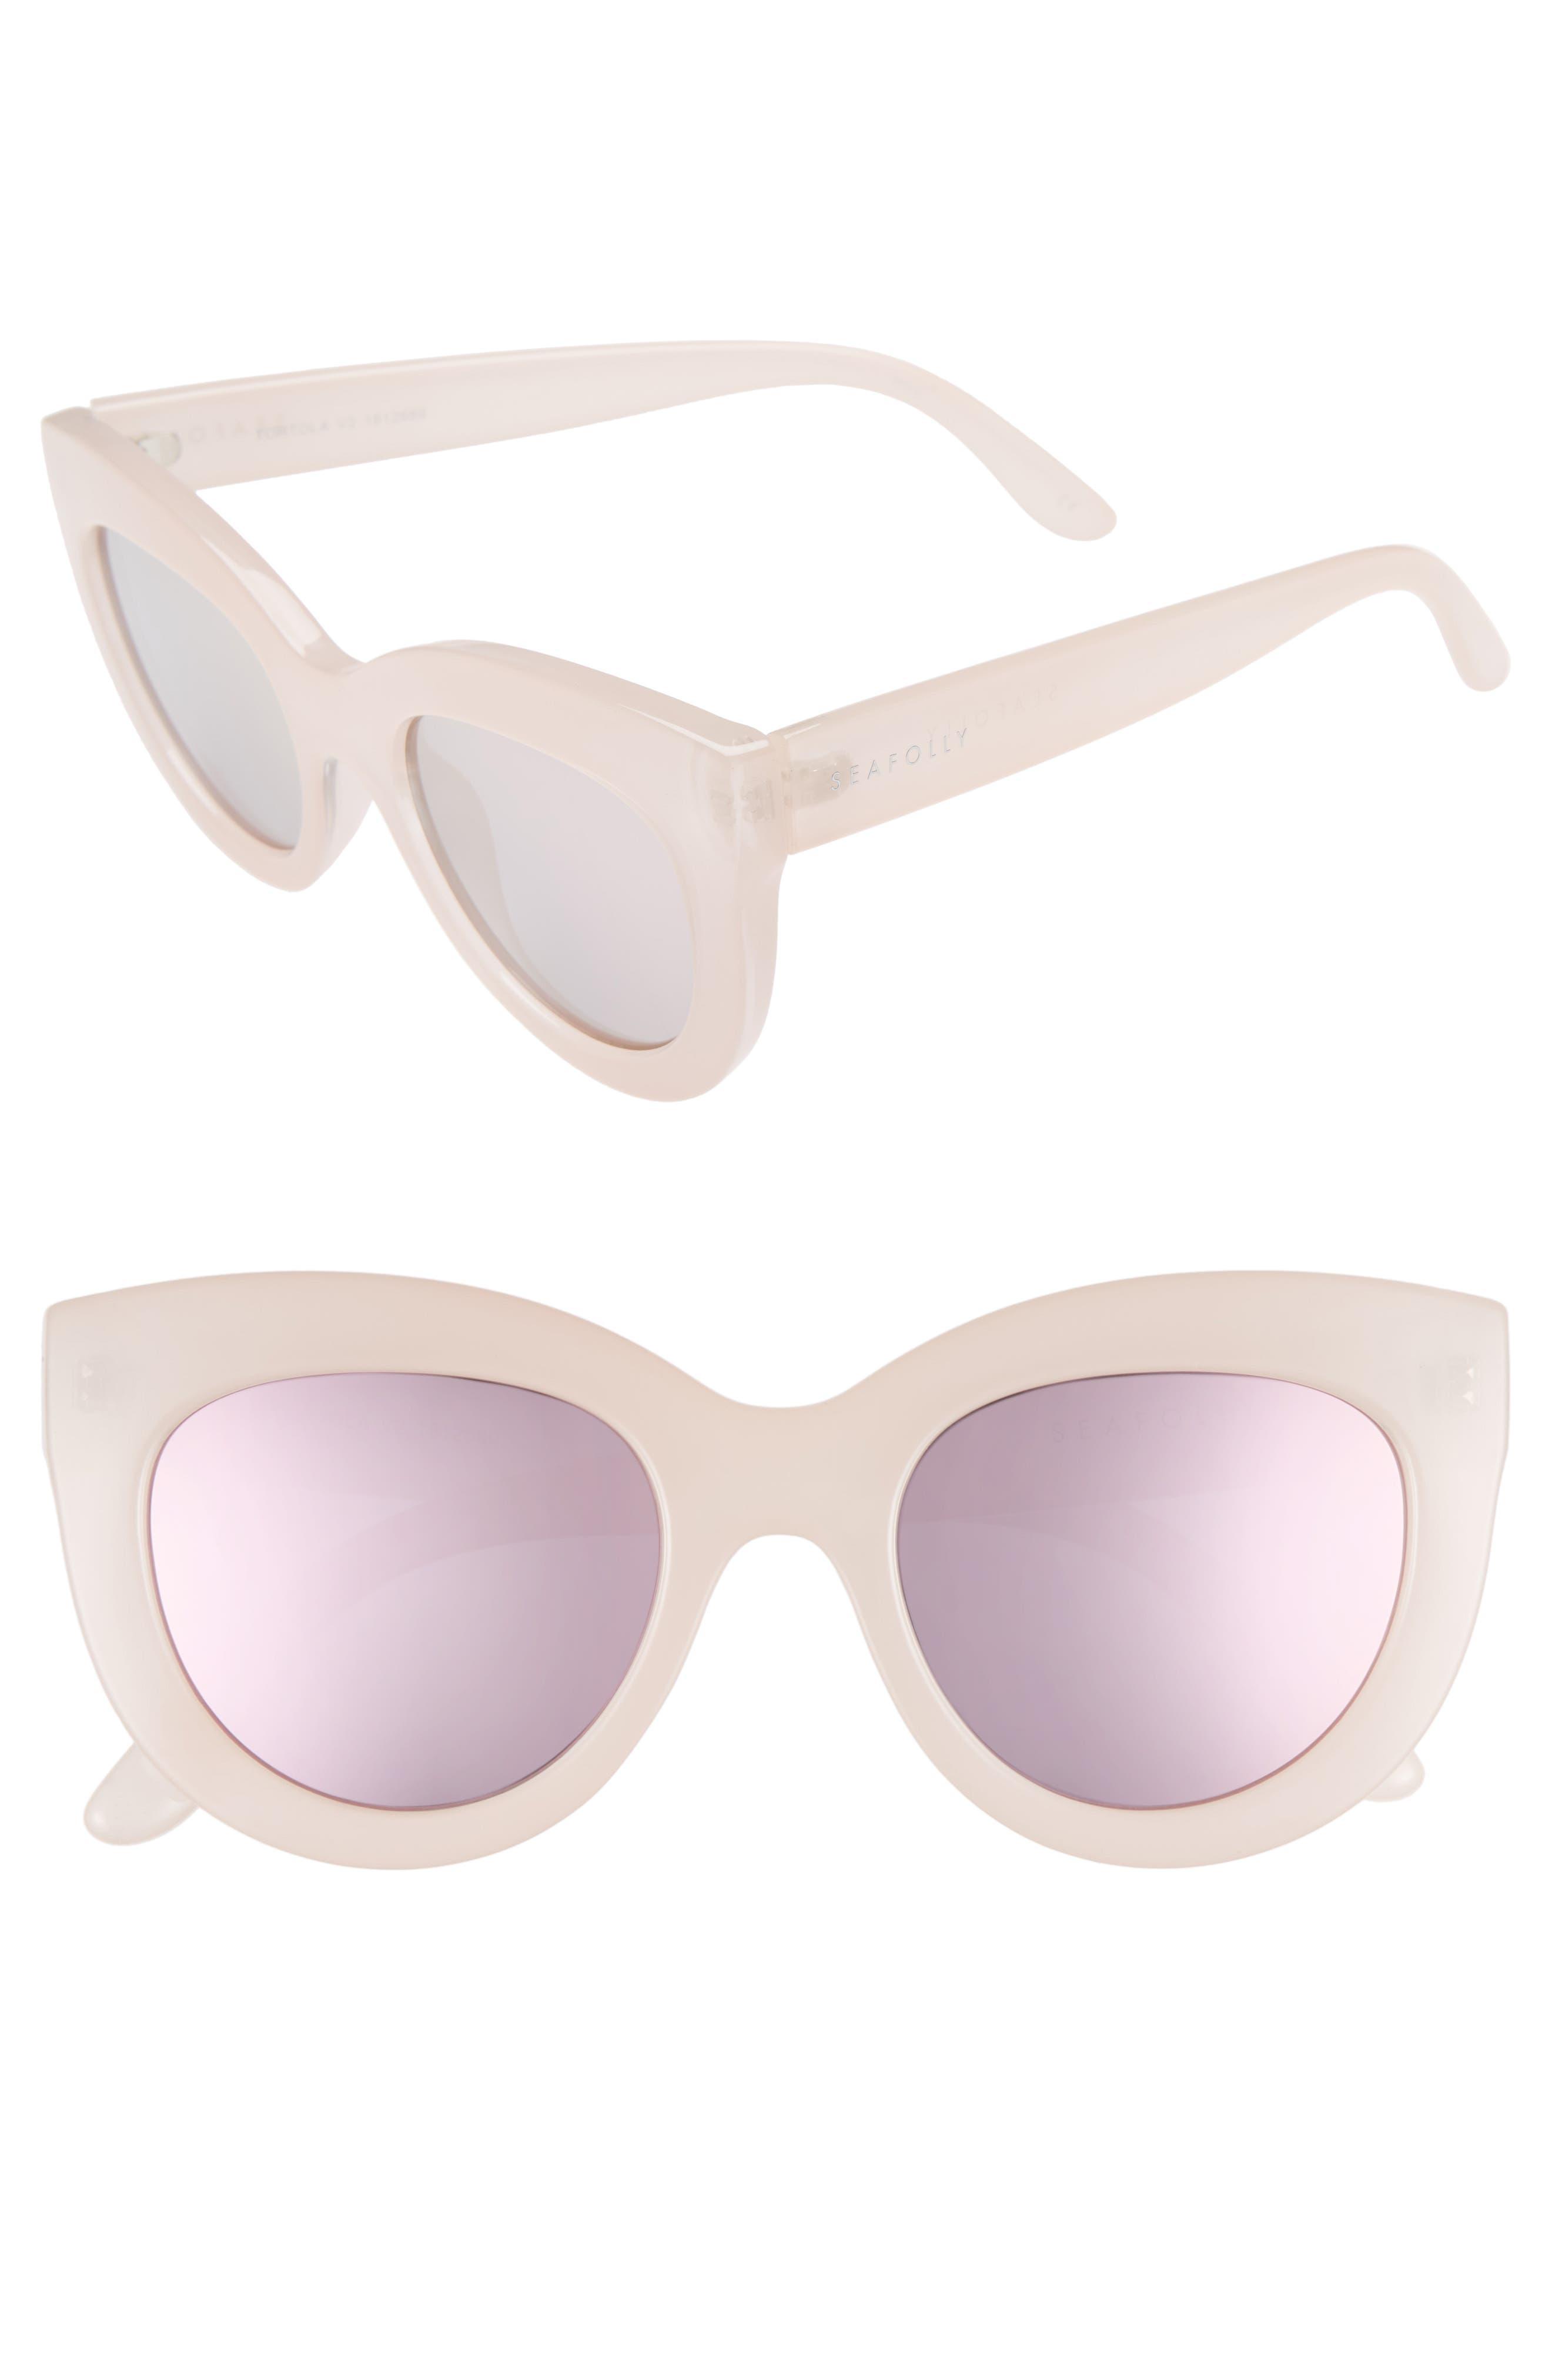 Torola V2 51mm Cat Eye Sunglasses,                             Main thumbnail 1, color,                             660